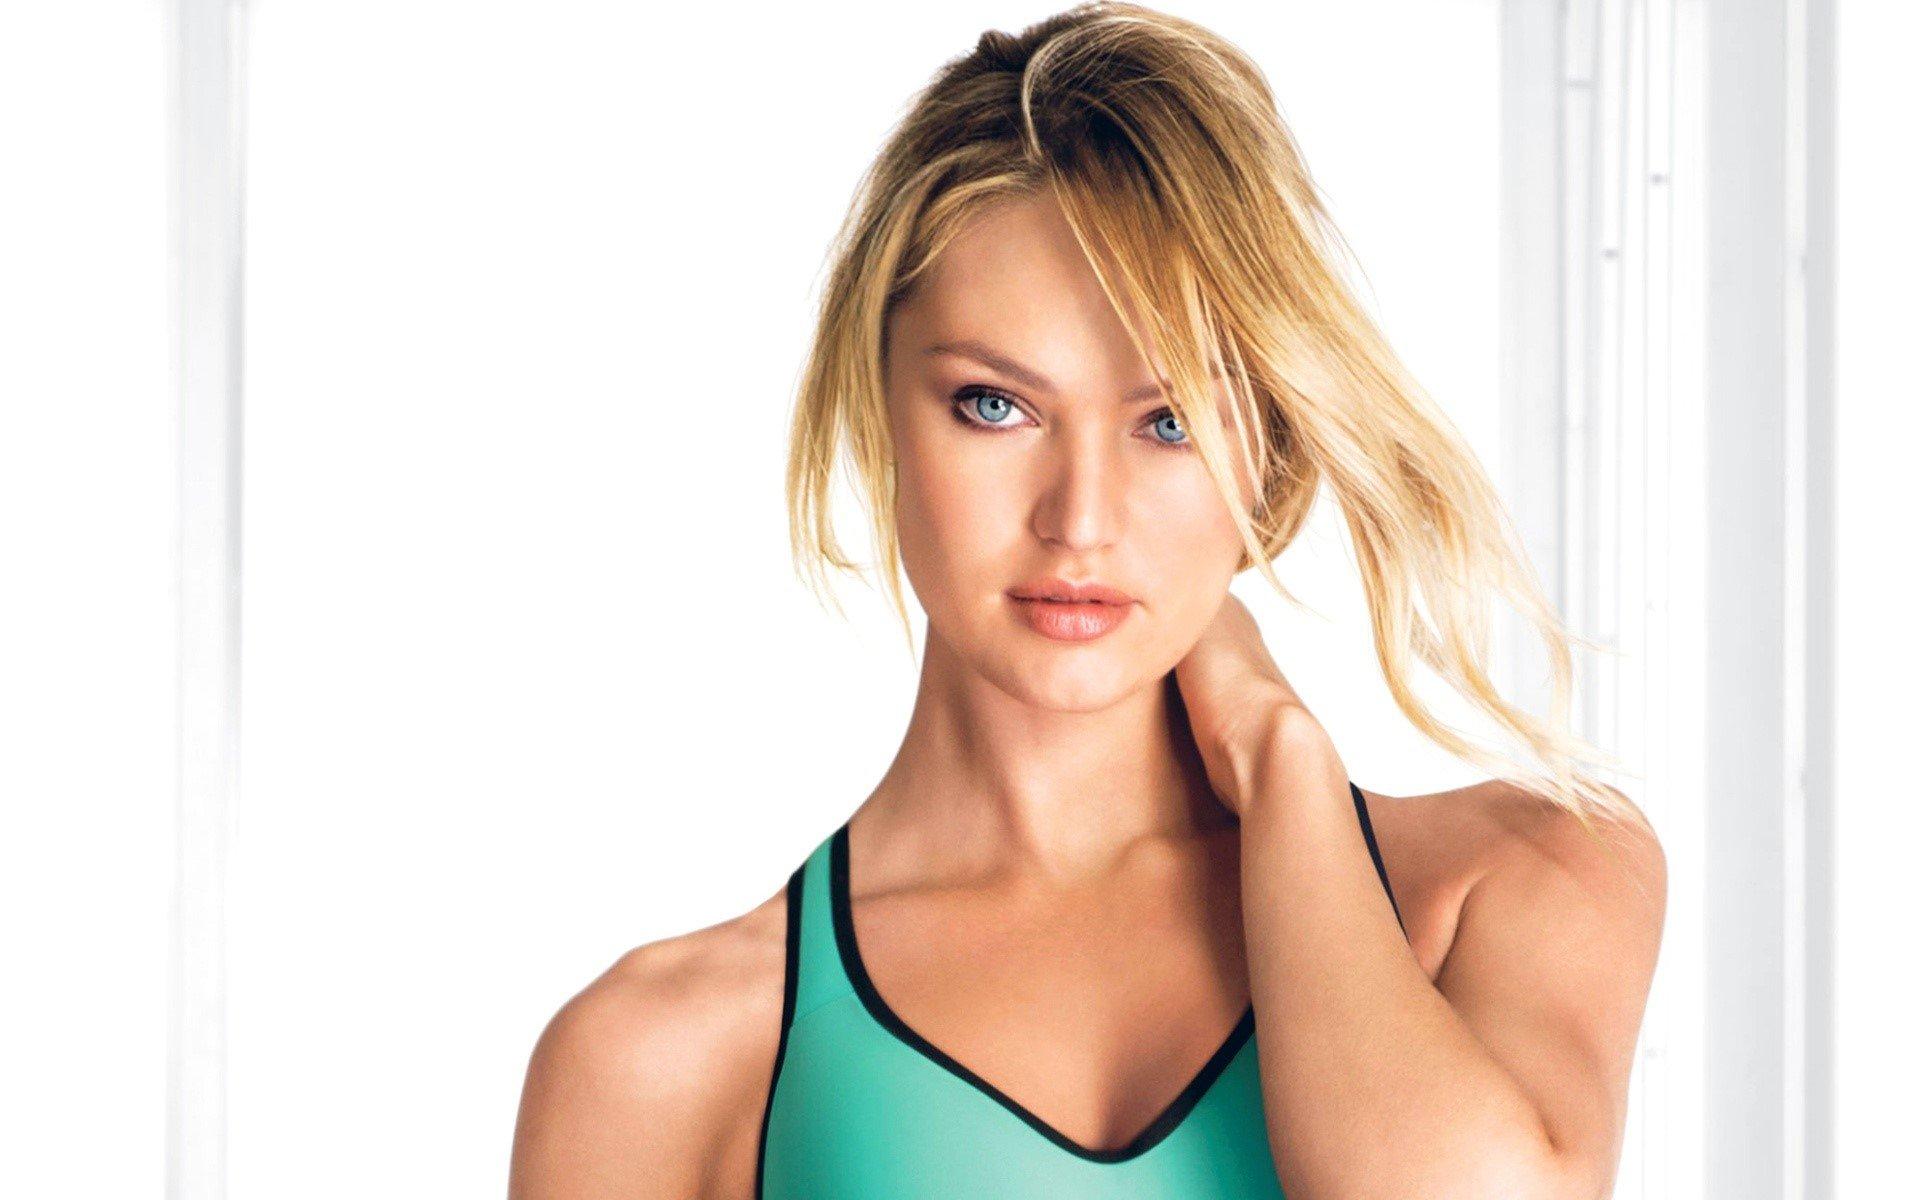 Wallpaper Model Candice Swanepoel disheveled